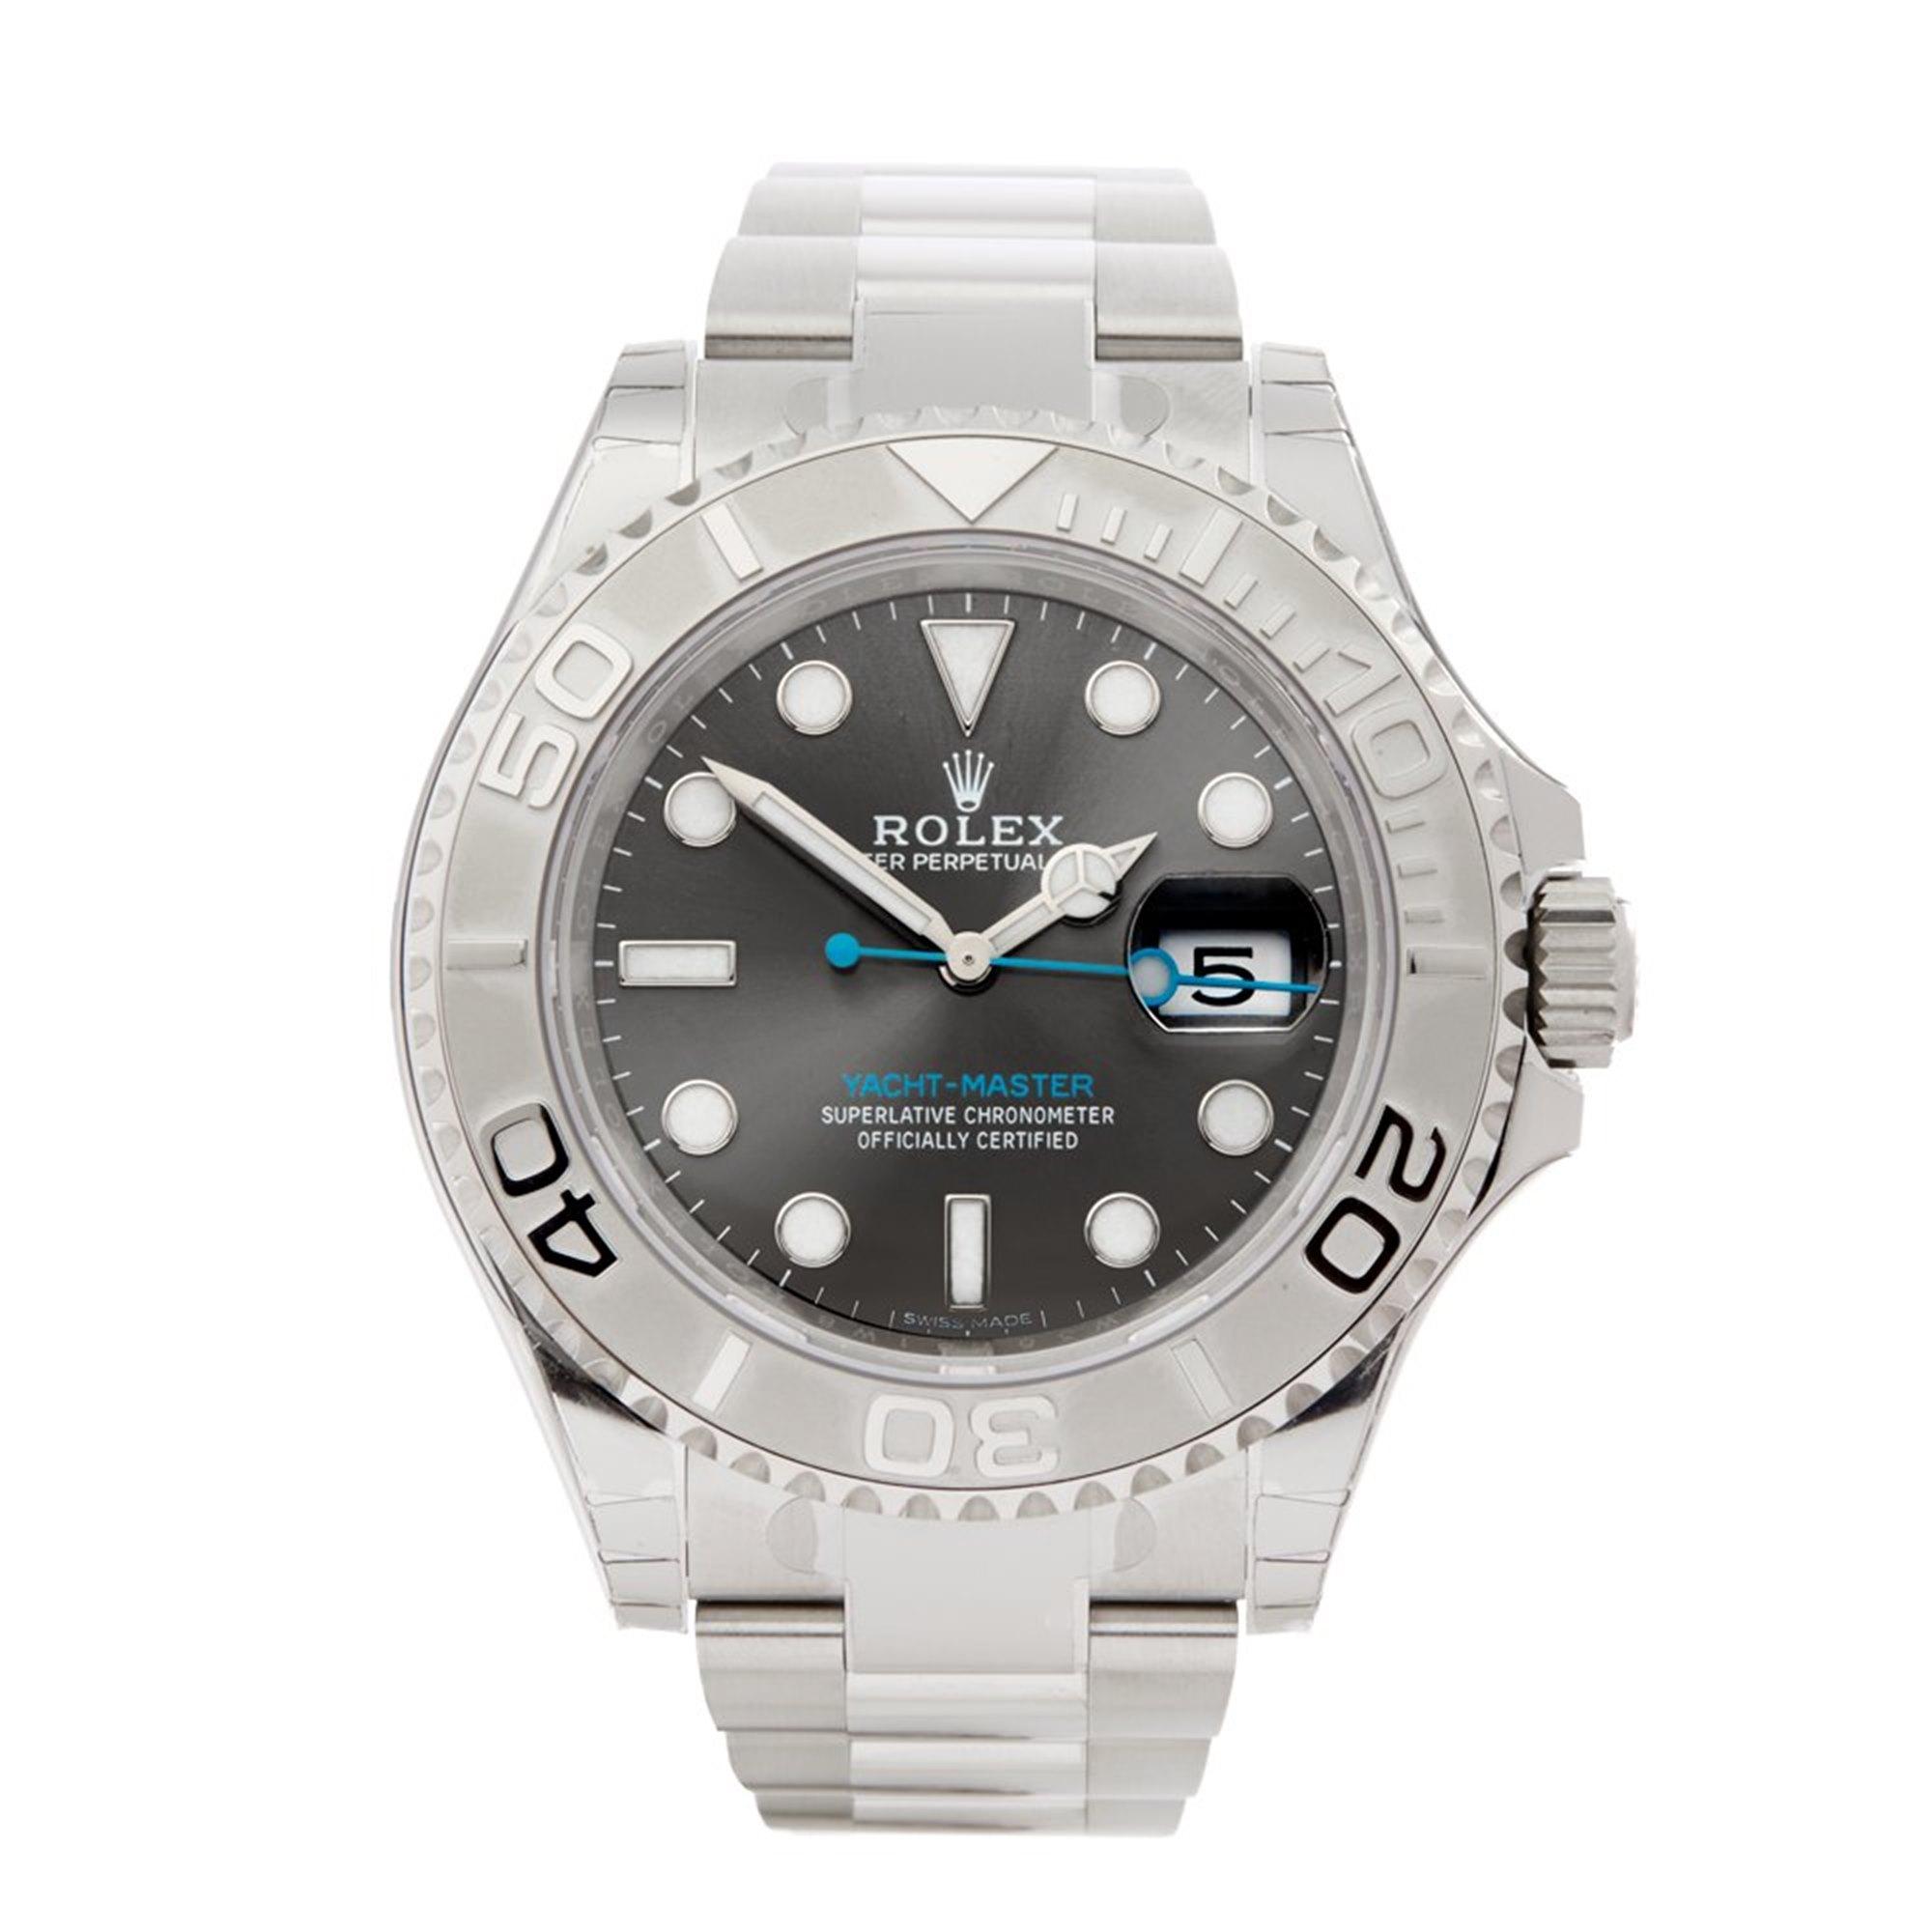 Rolex Yacht-Master Stainless Steel 116622